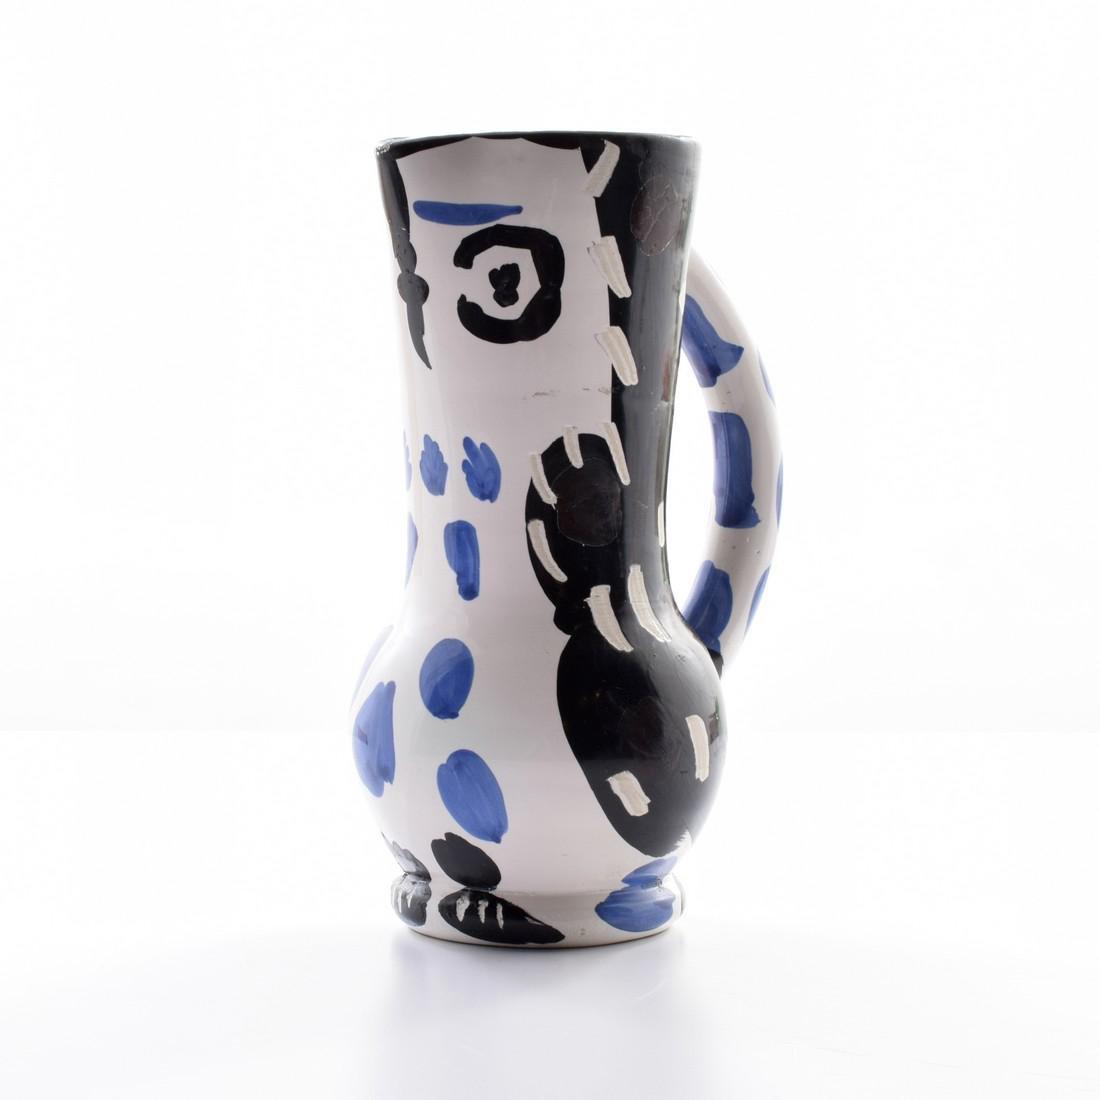 Pablo Picasso CRUCHON HIBOU Vase / Pitcher